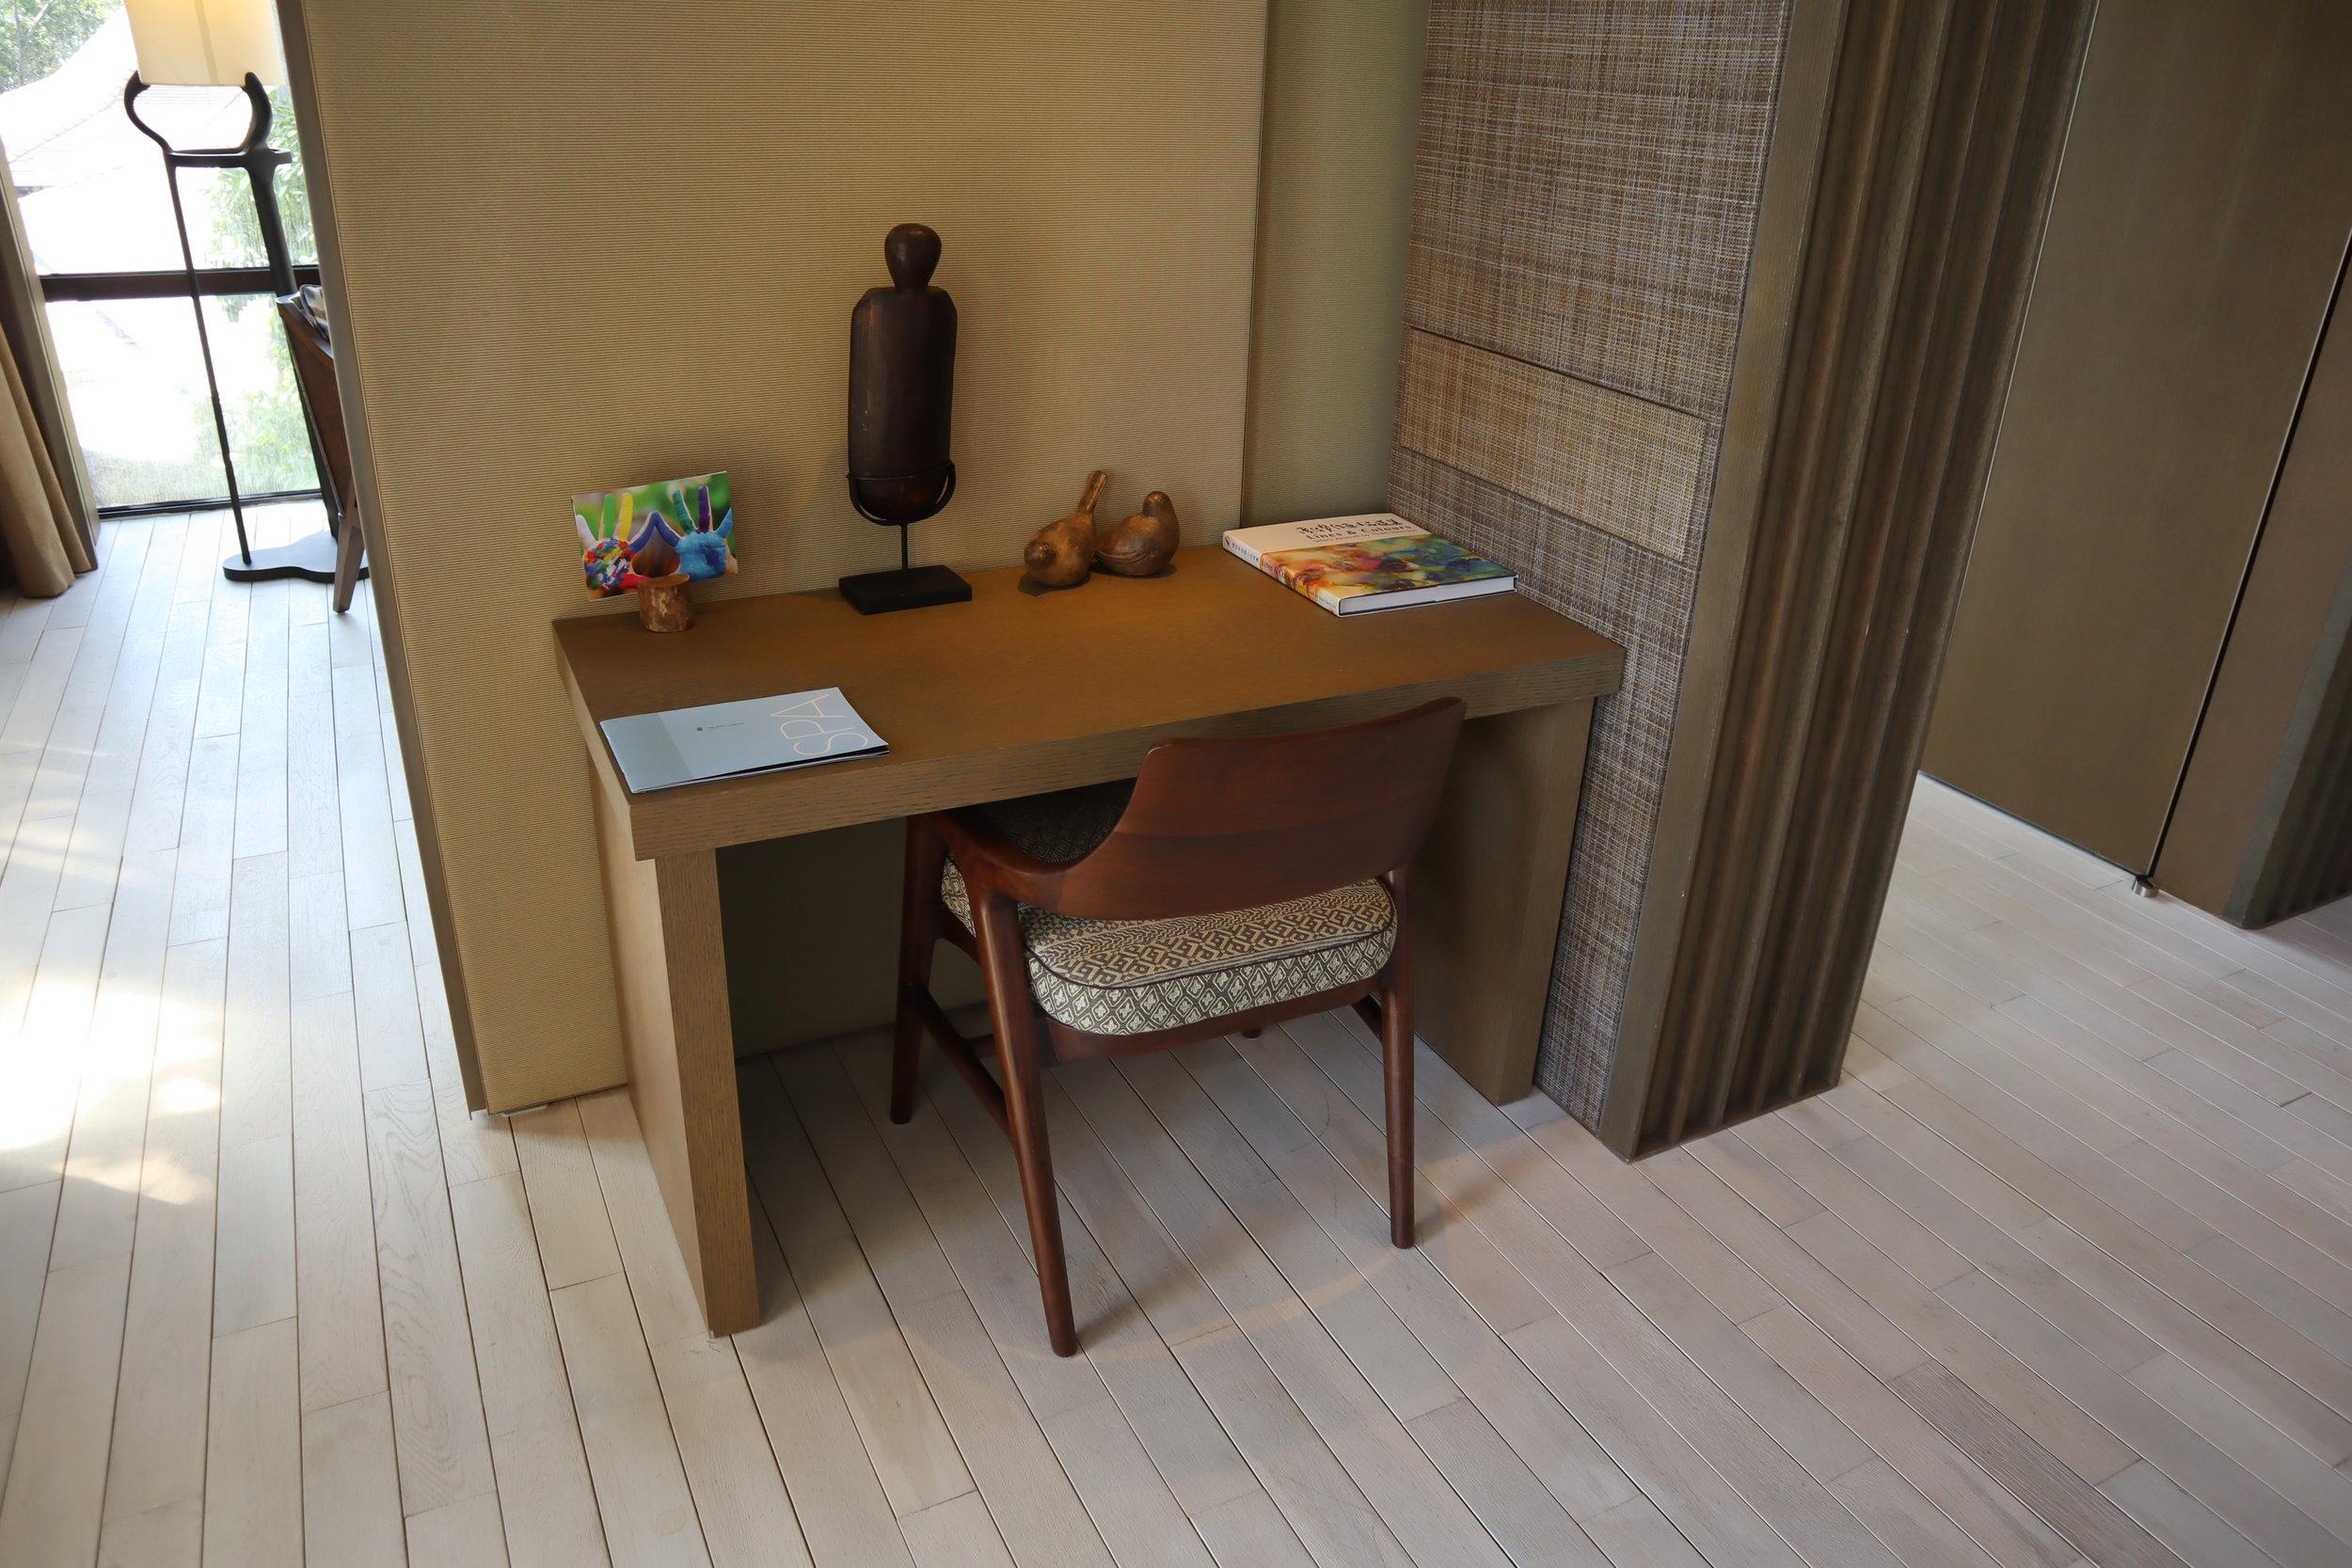 The Ritz-Carlton, Langkawi – Rainforest Junior Suite desk